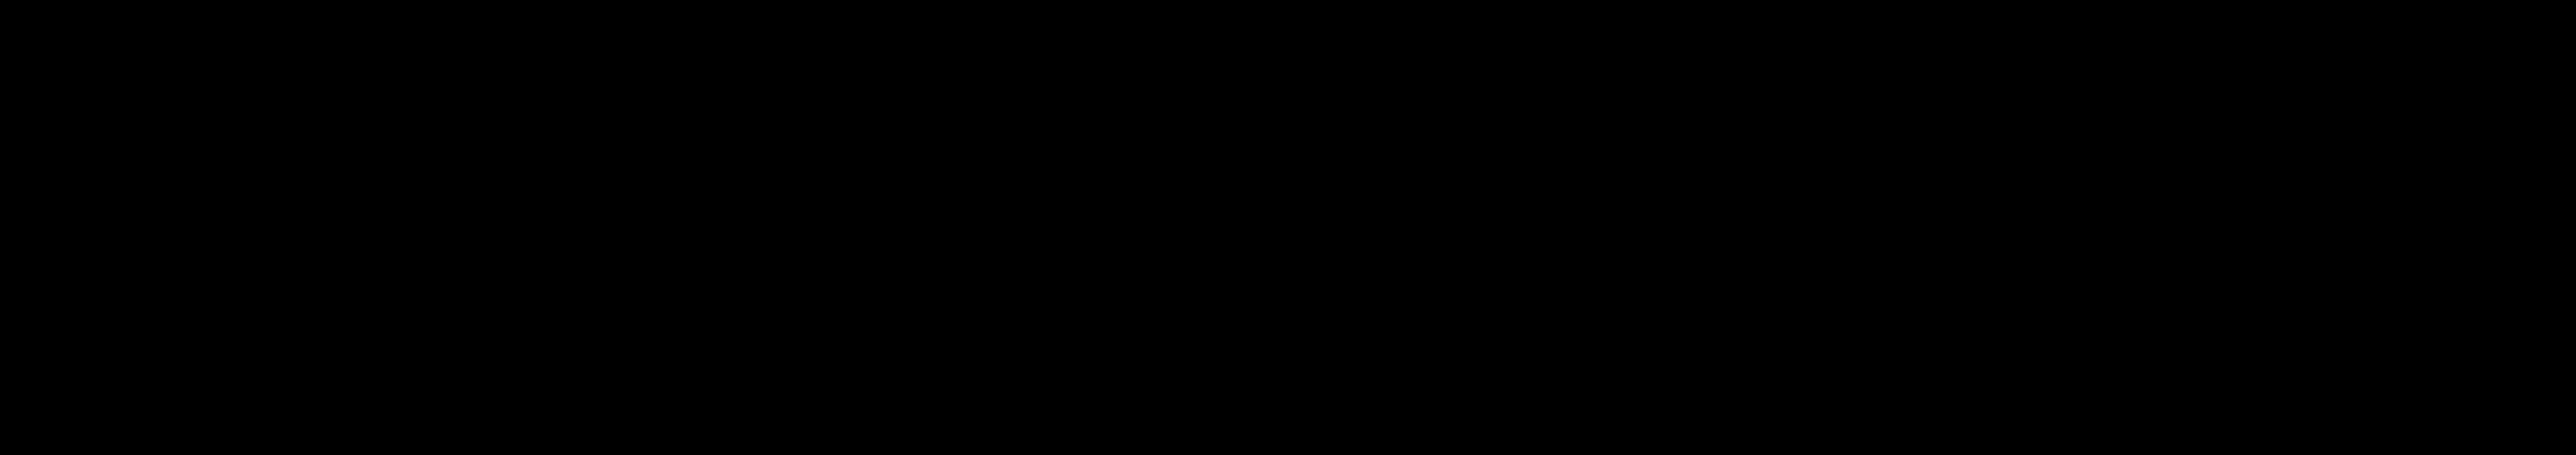 katana avenica logo